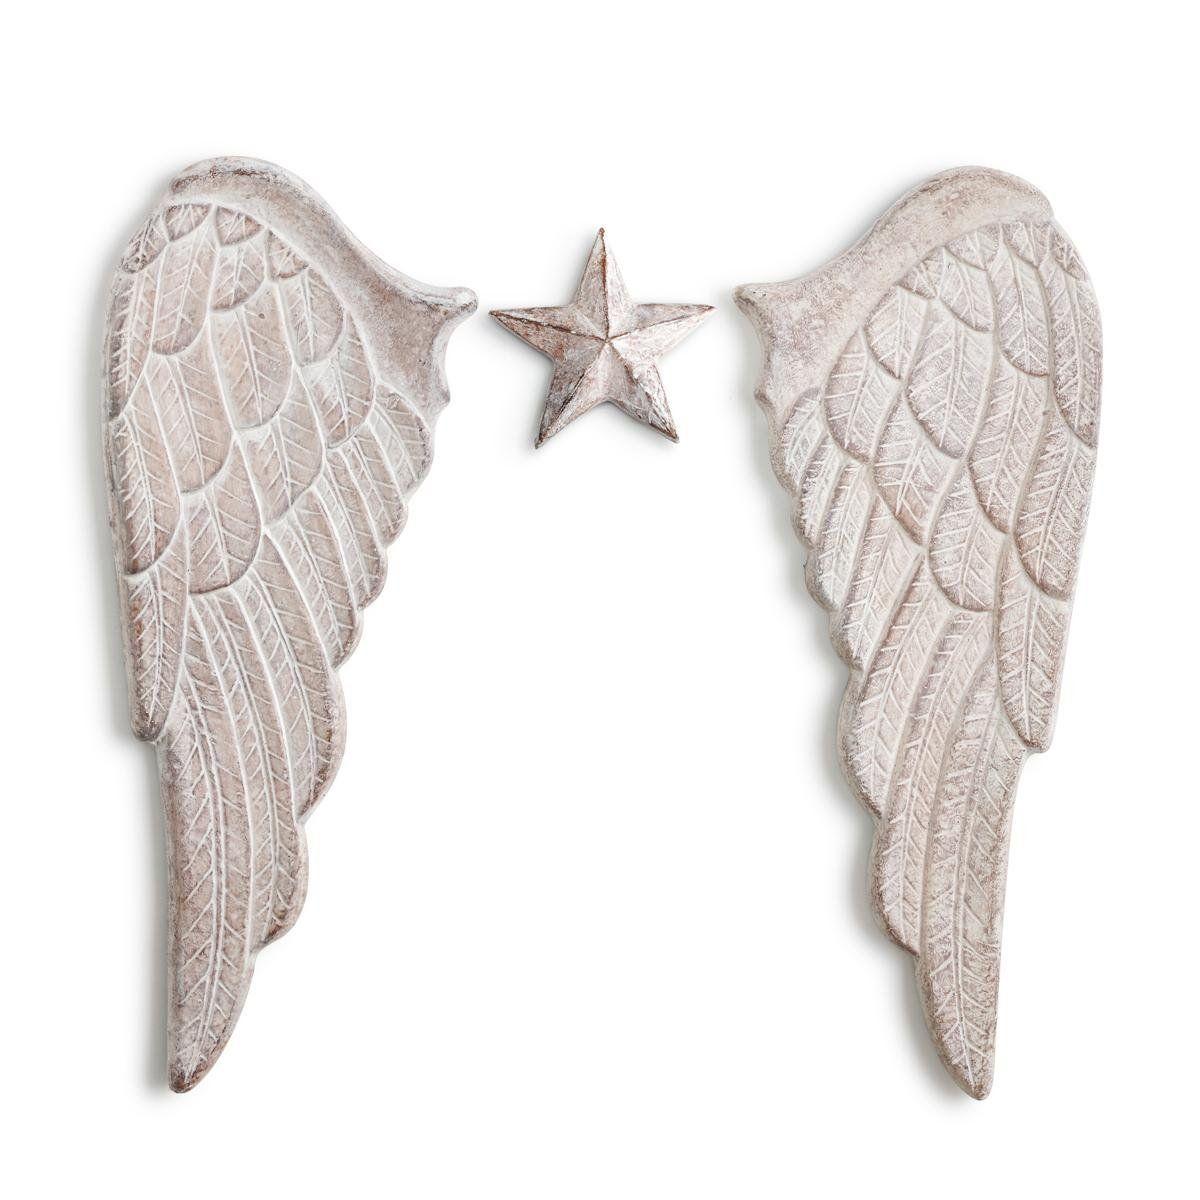 Amazon.com: DEMDACO Silvestri Angel Wings Wall Art: Home & Kitchen ...